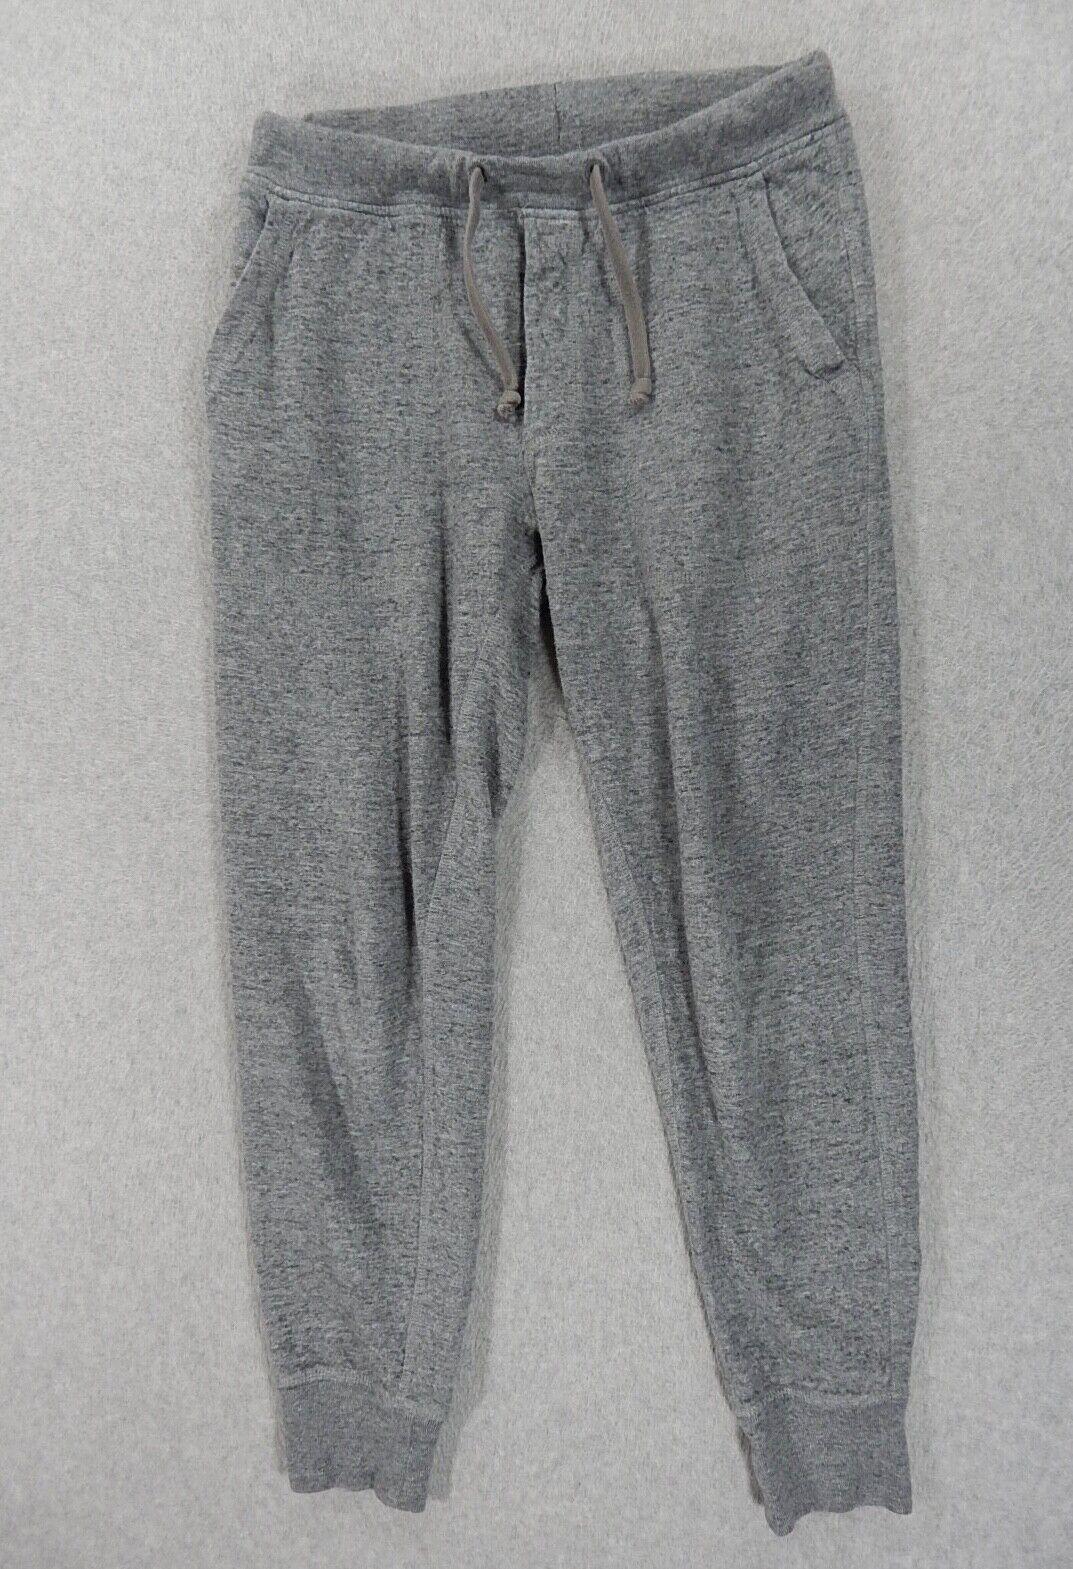 J Crew Knit Goods 100% Cotton Jogger Sweatpants (Womens Medium) Gray